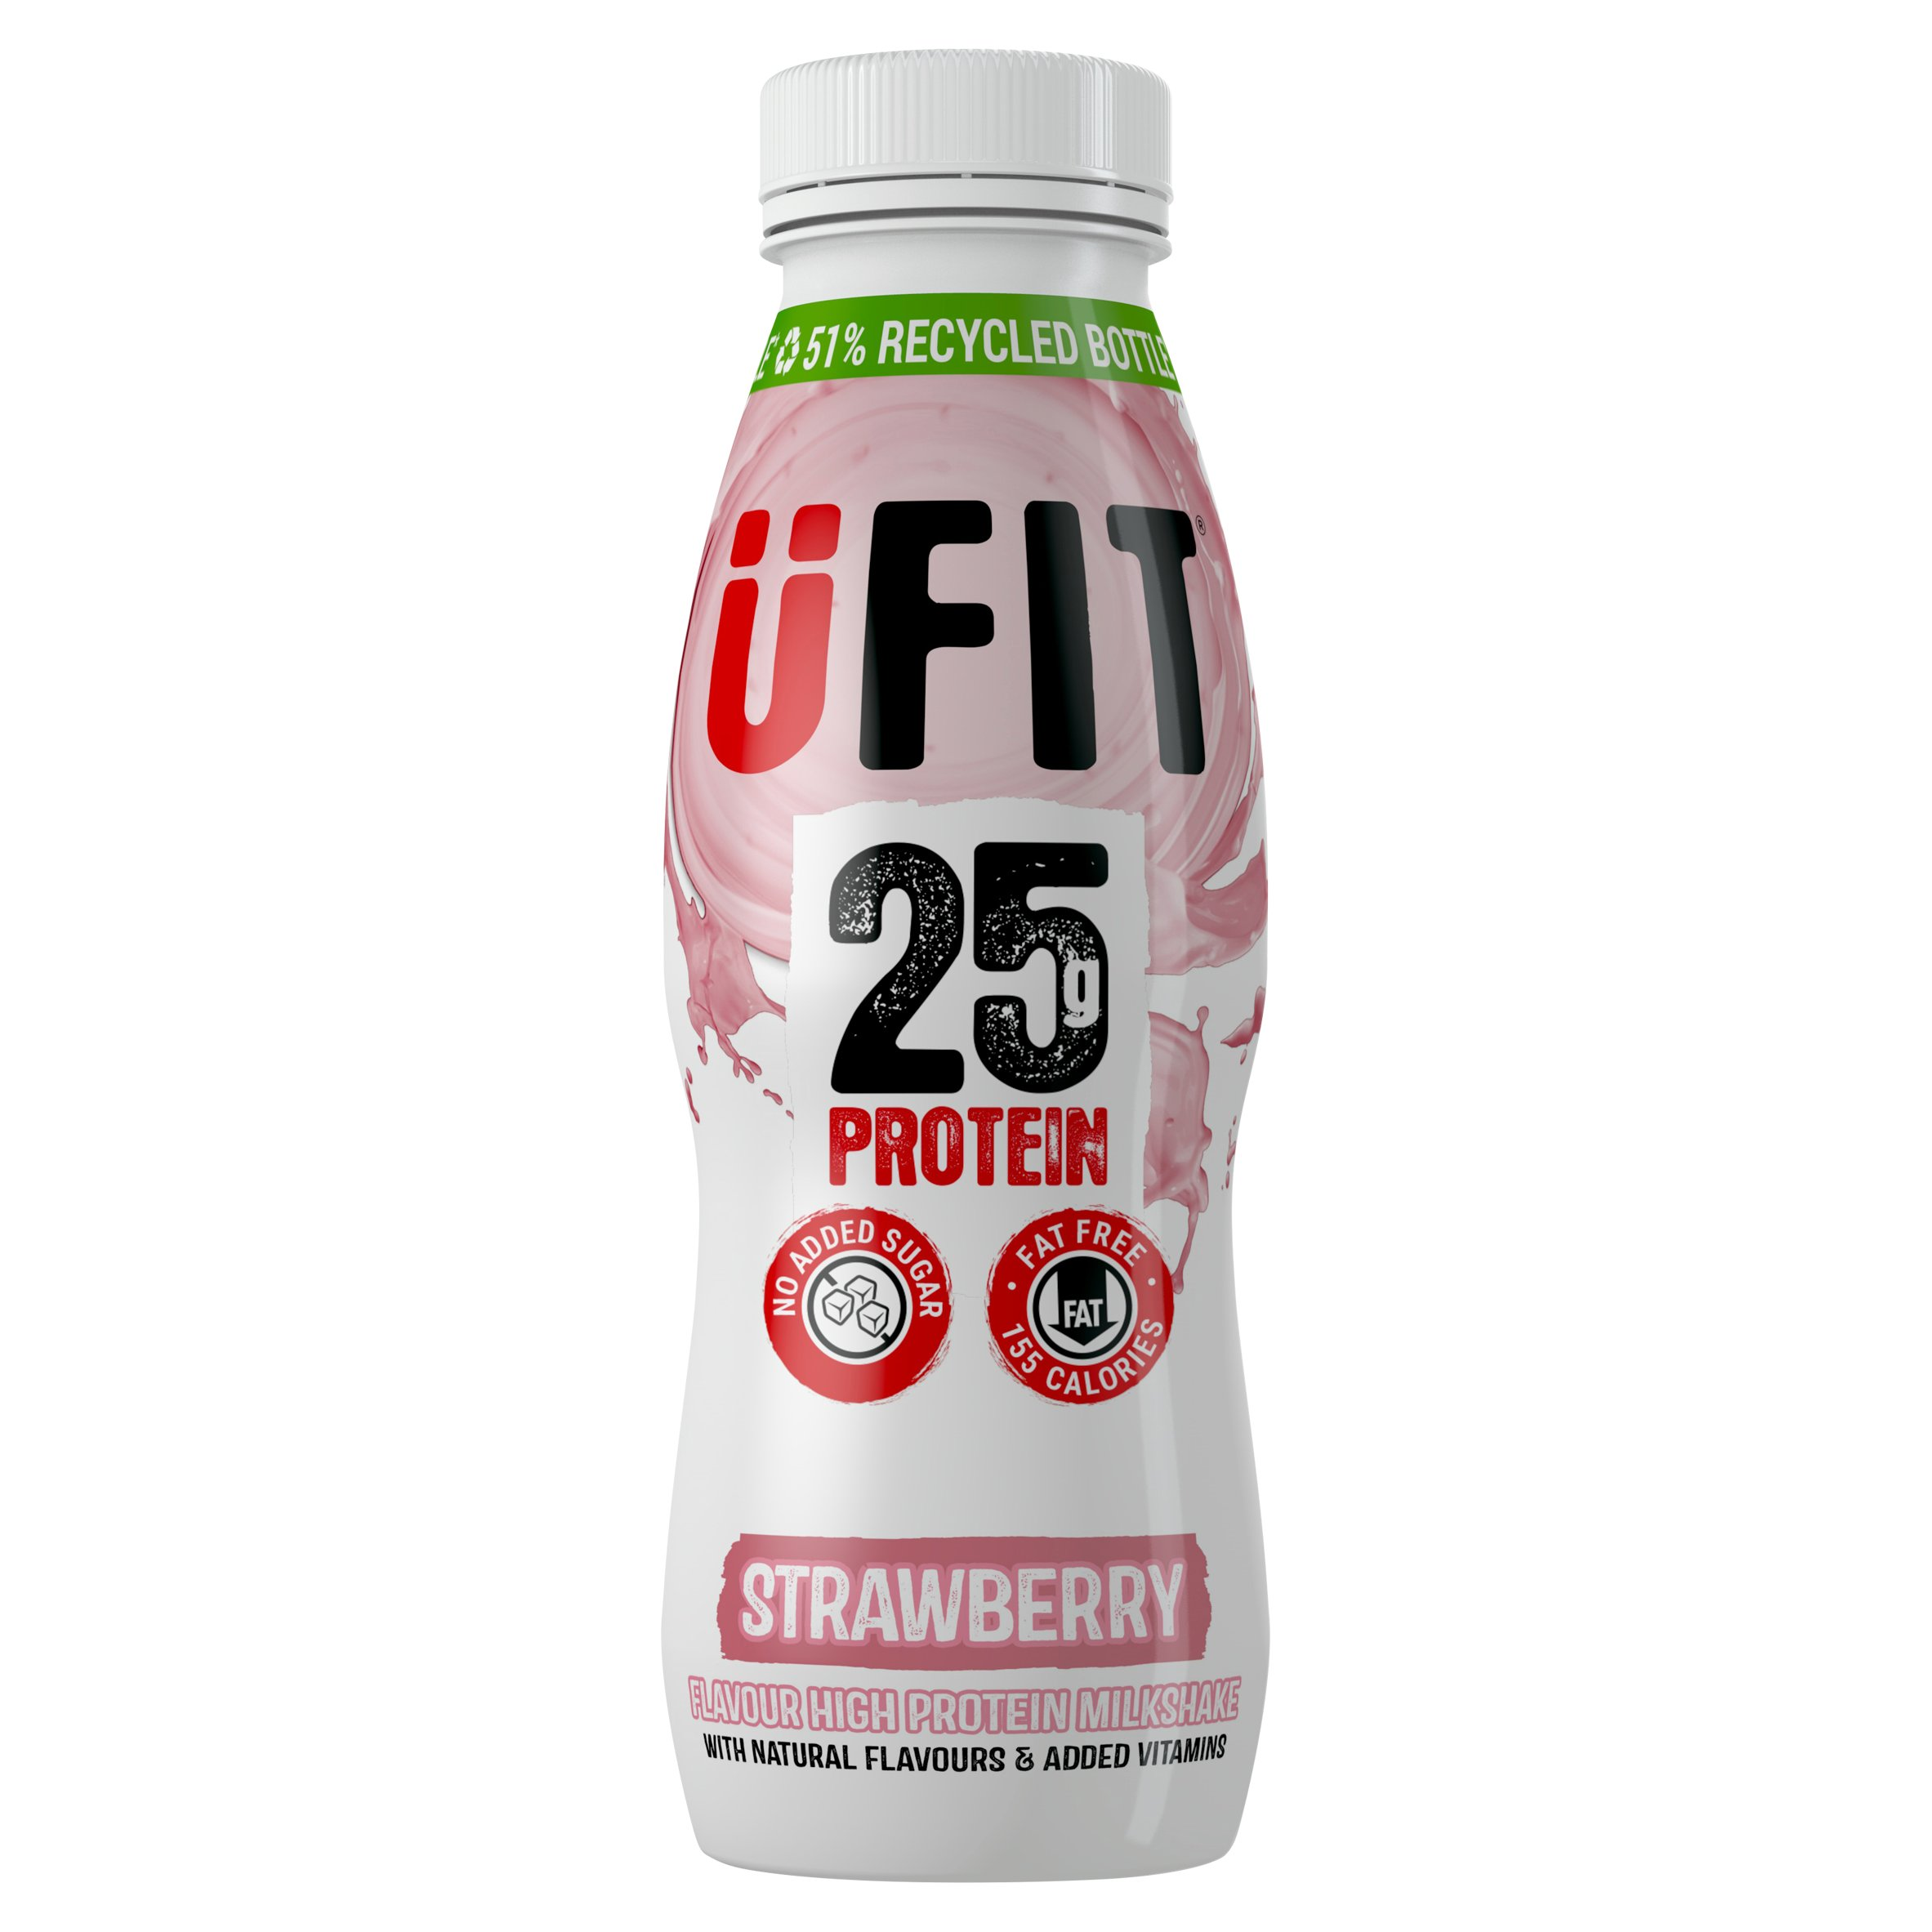 Ufit High Protein Milkshake Drink Strawberry 330Ml